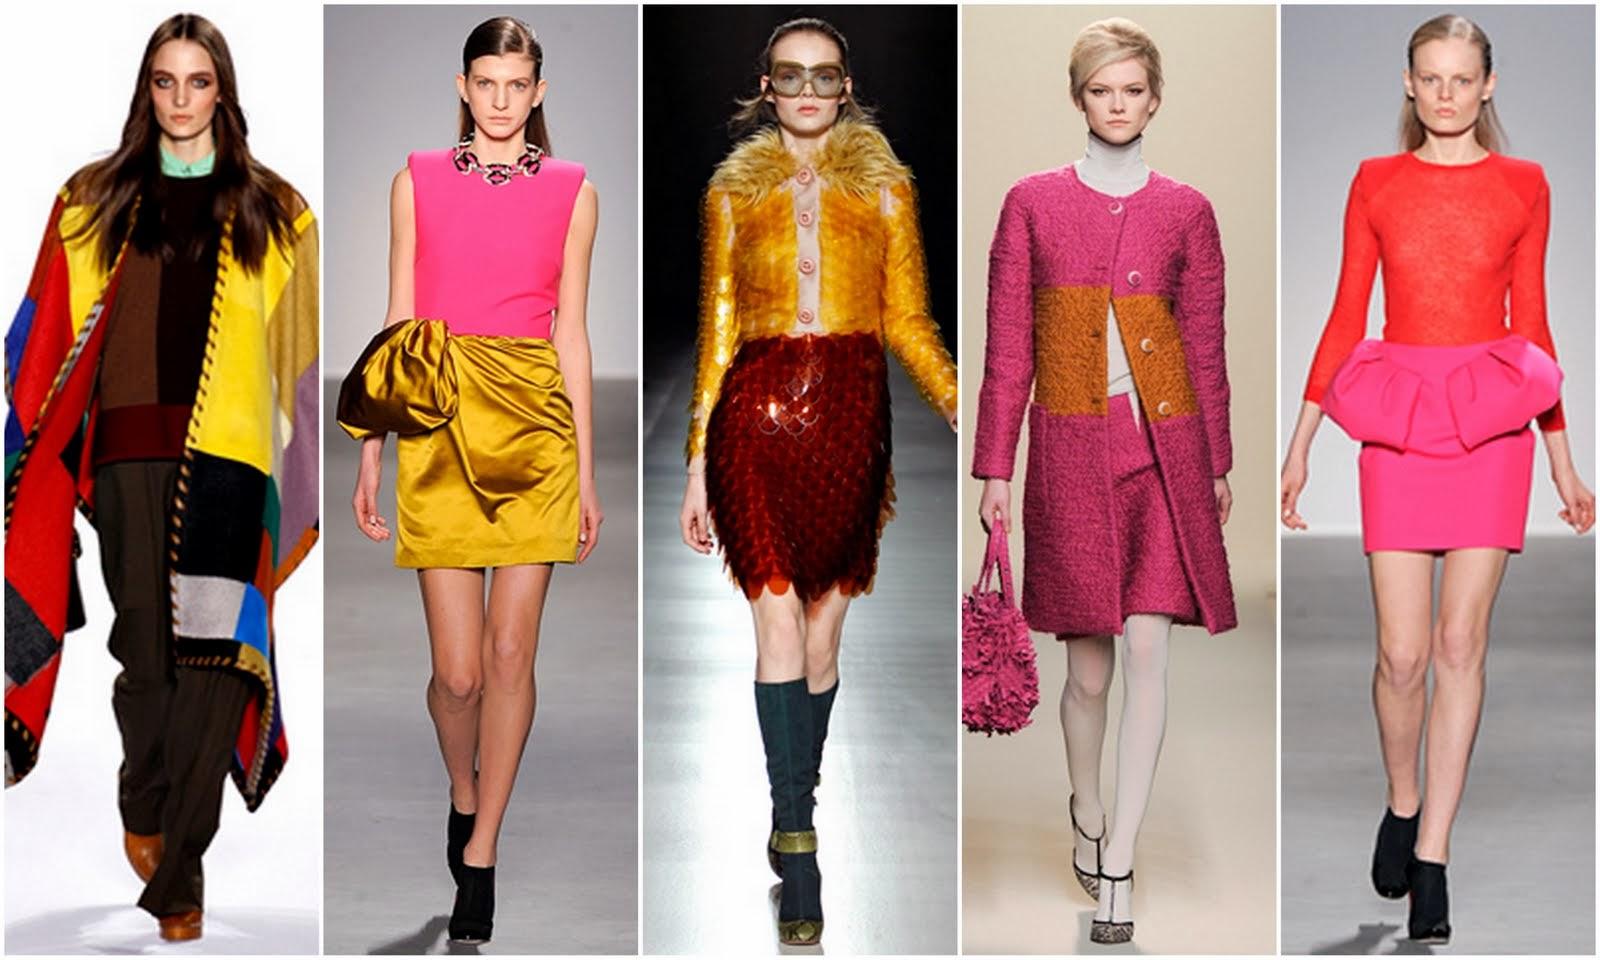 Pin 90s Fashion ...90s Fashion Trends